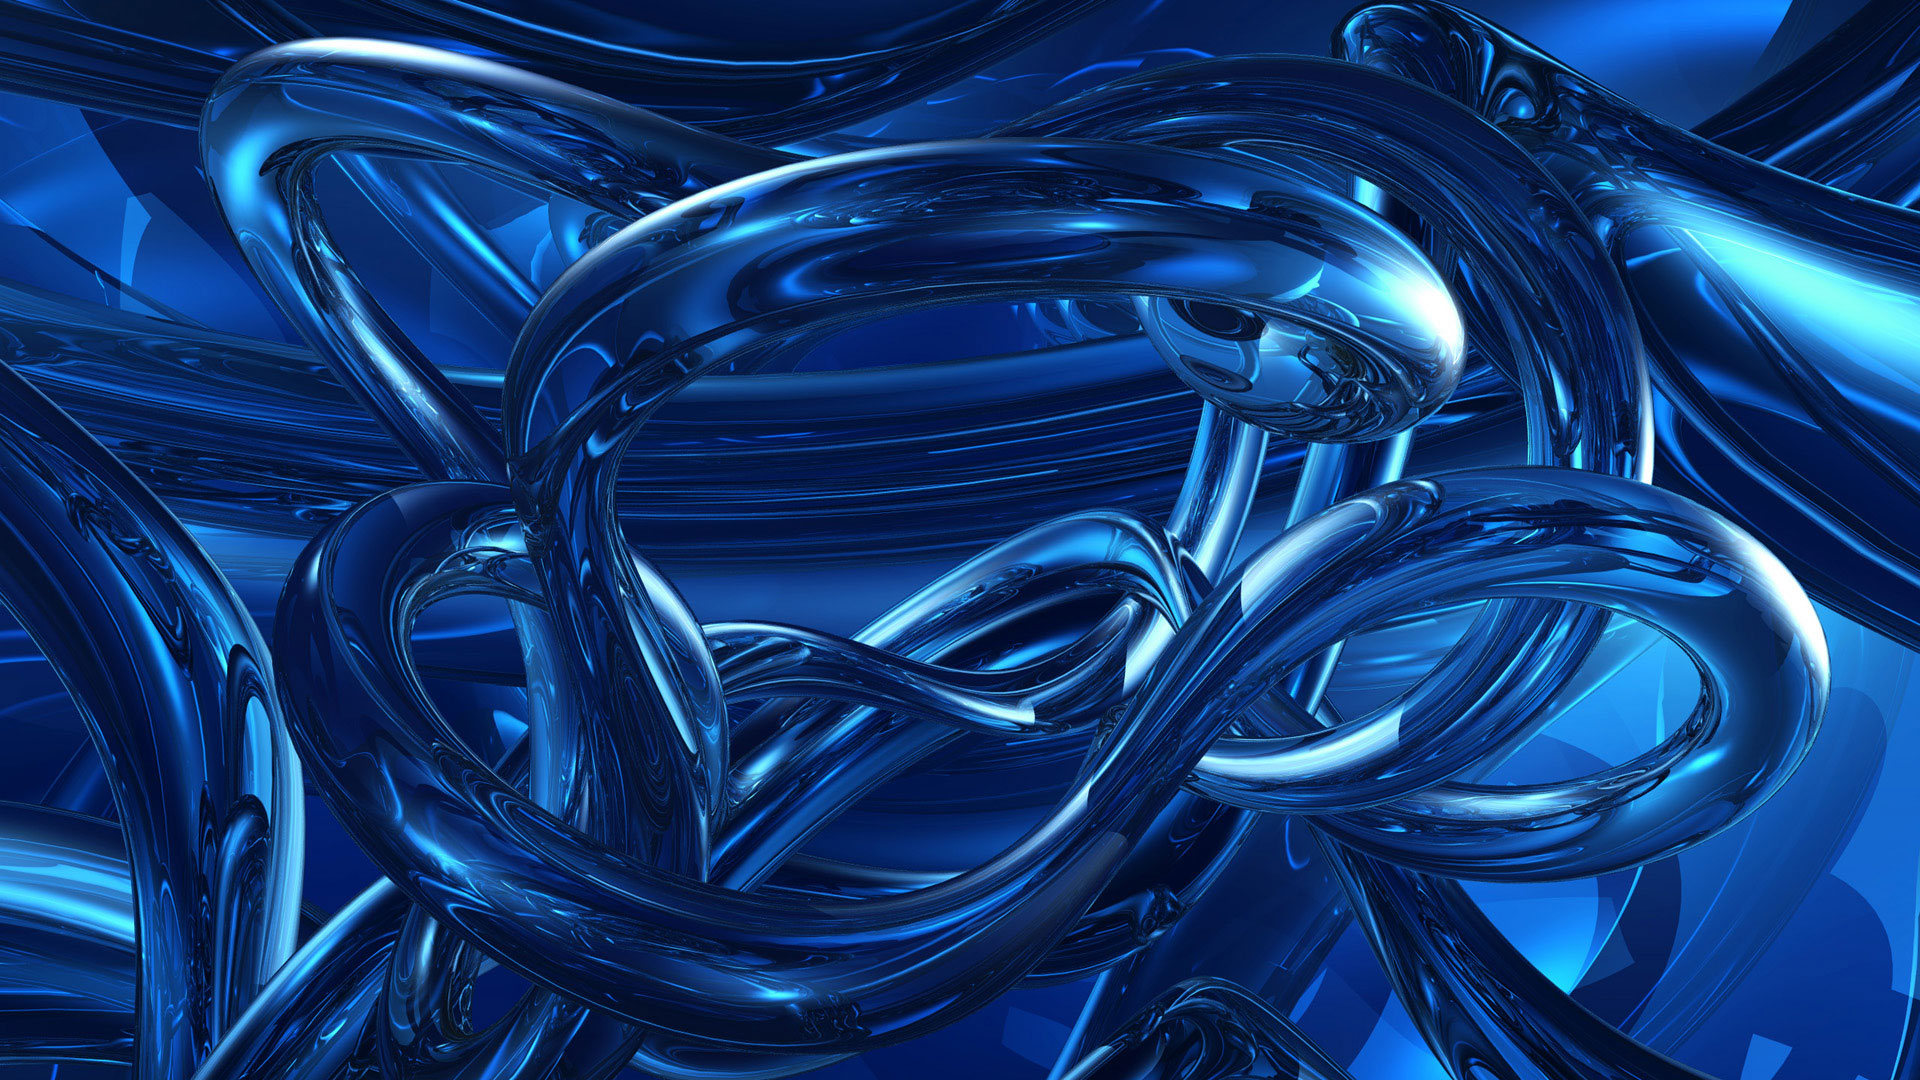 Abstract Desktop Backgrounds HD Wallpapers Art Images dark blue 1920x1080